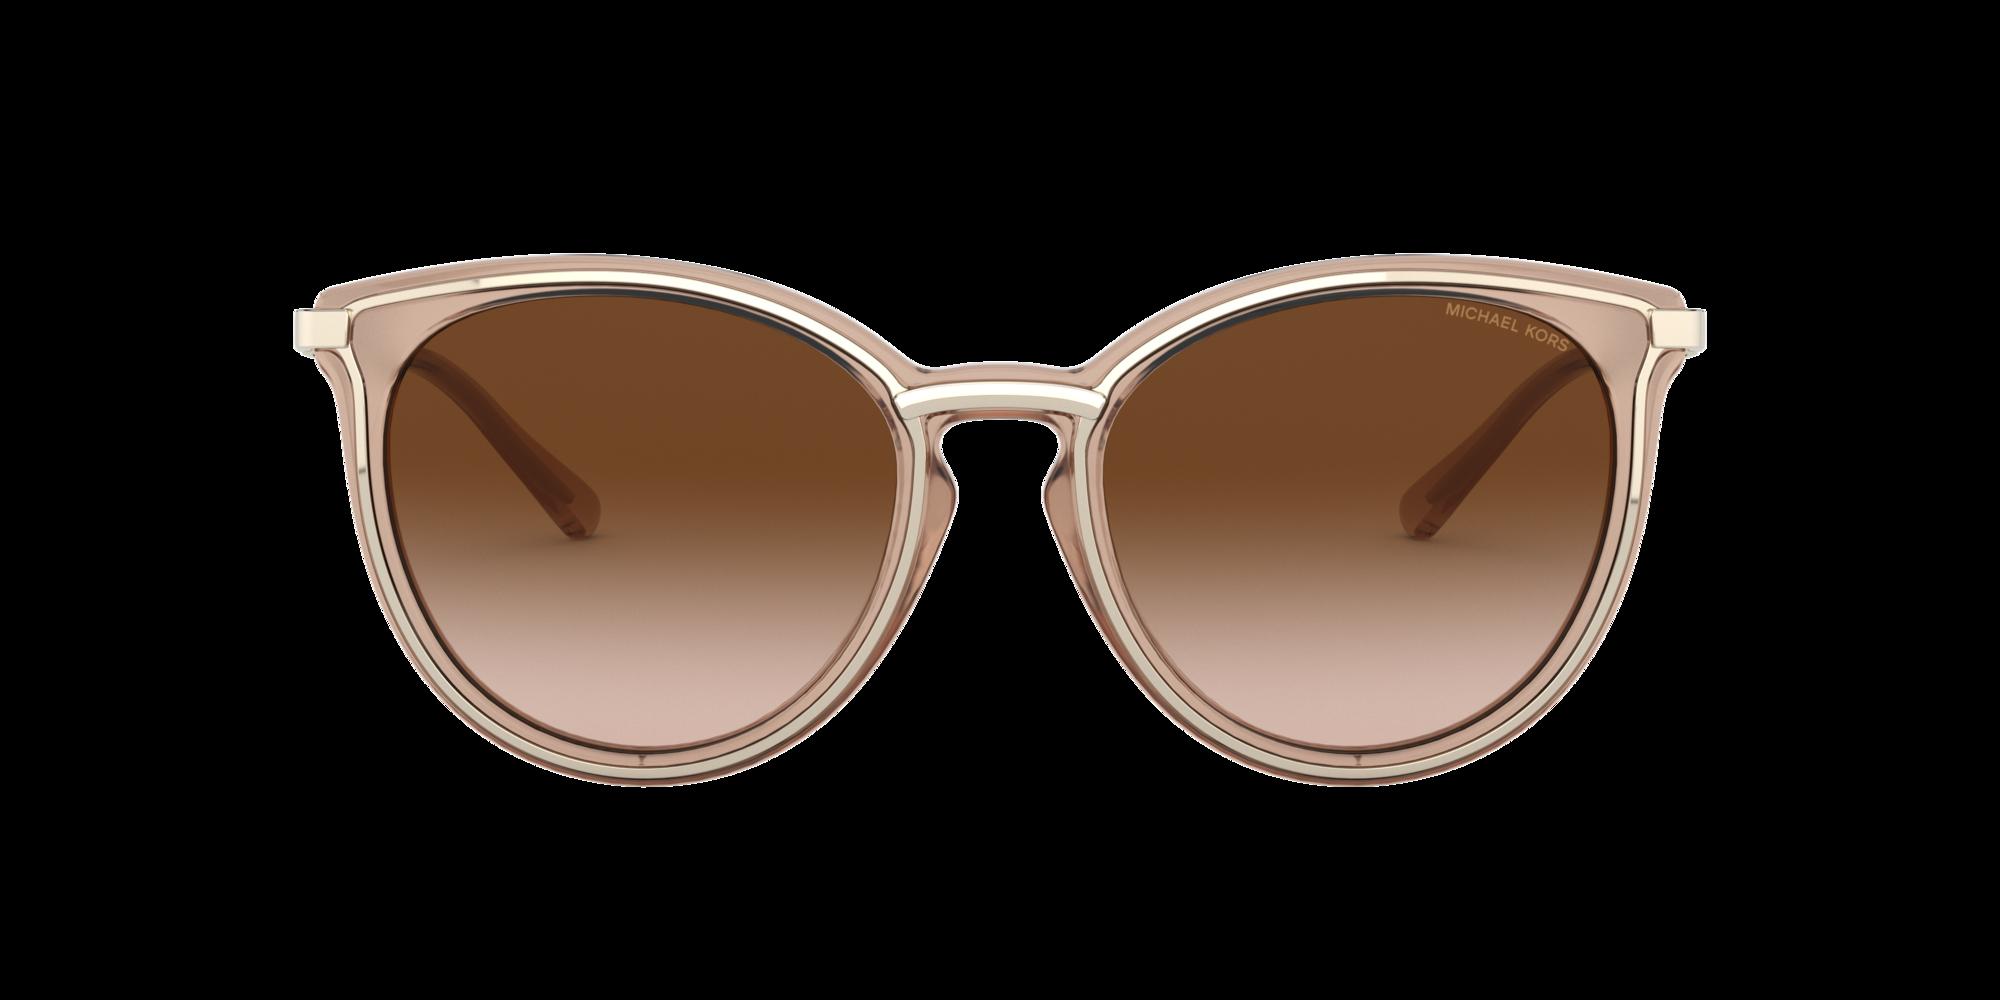 Image for BRISBANE from LensCrafters | Glasses, Prescription Glasses Online, Eyewear